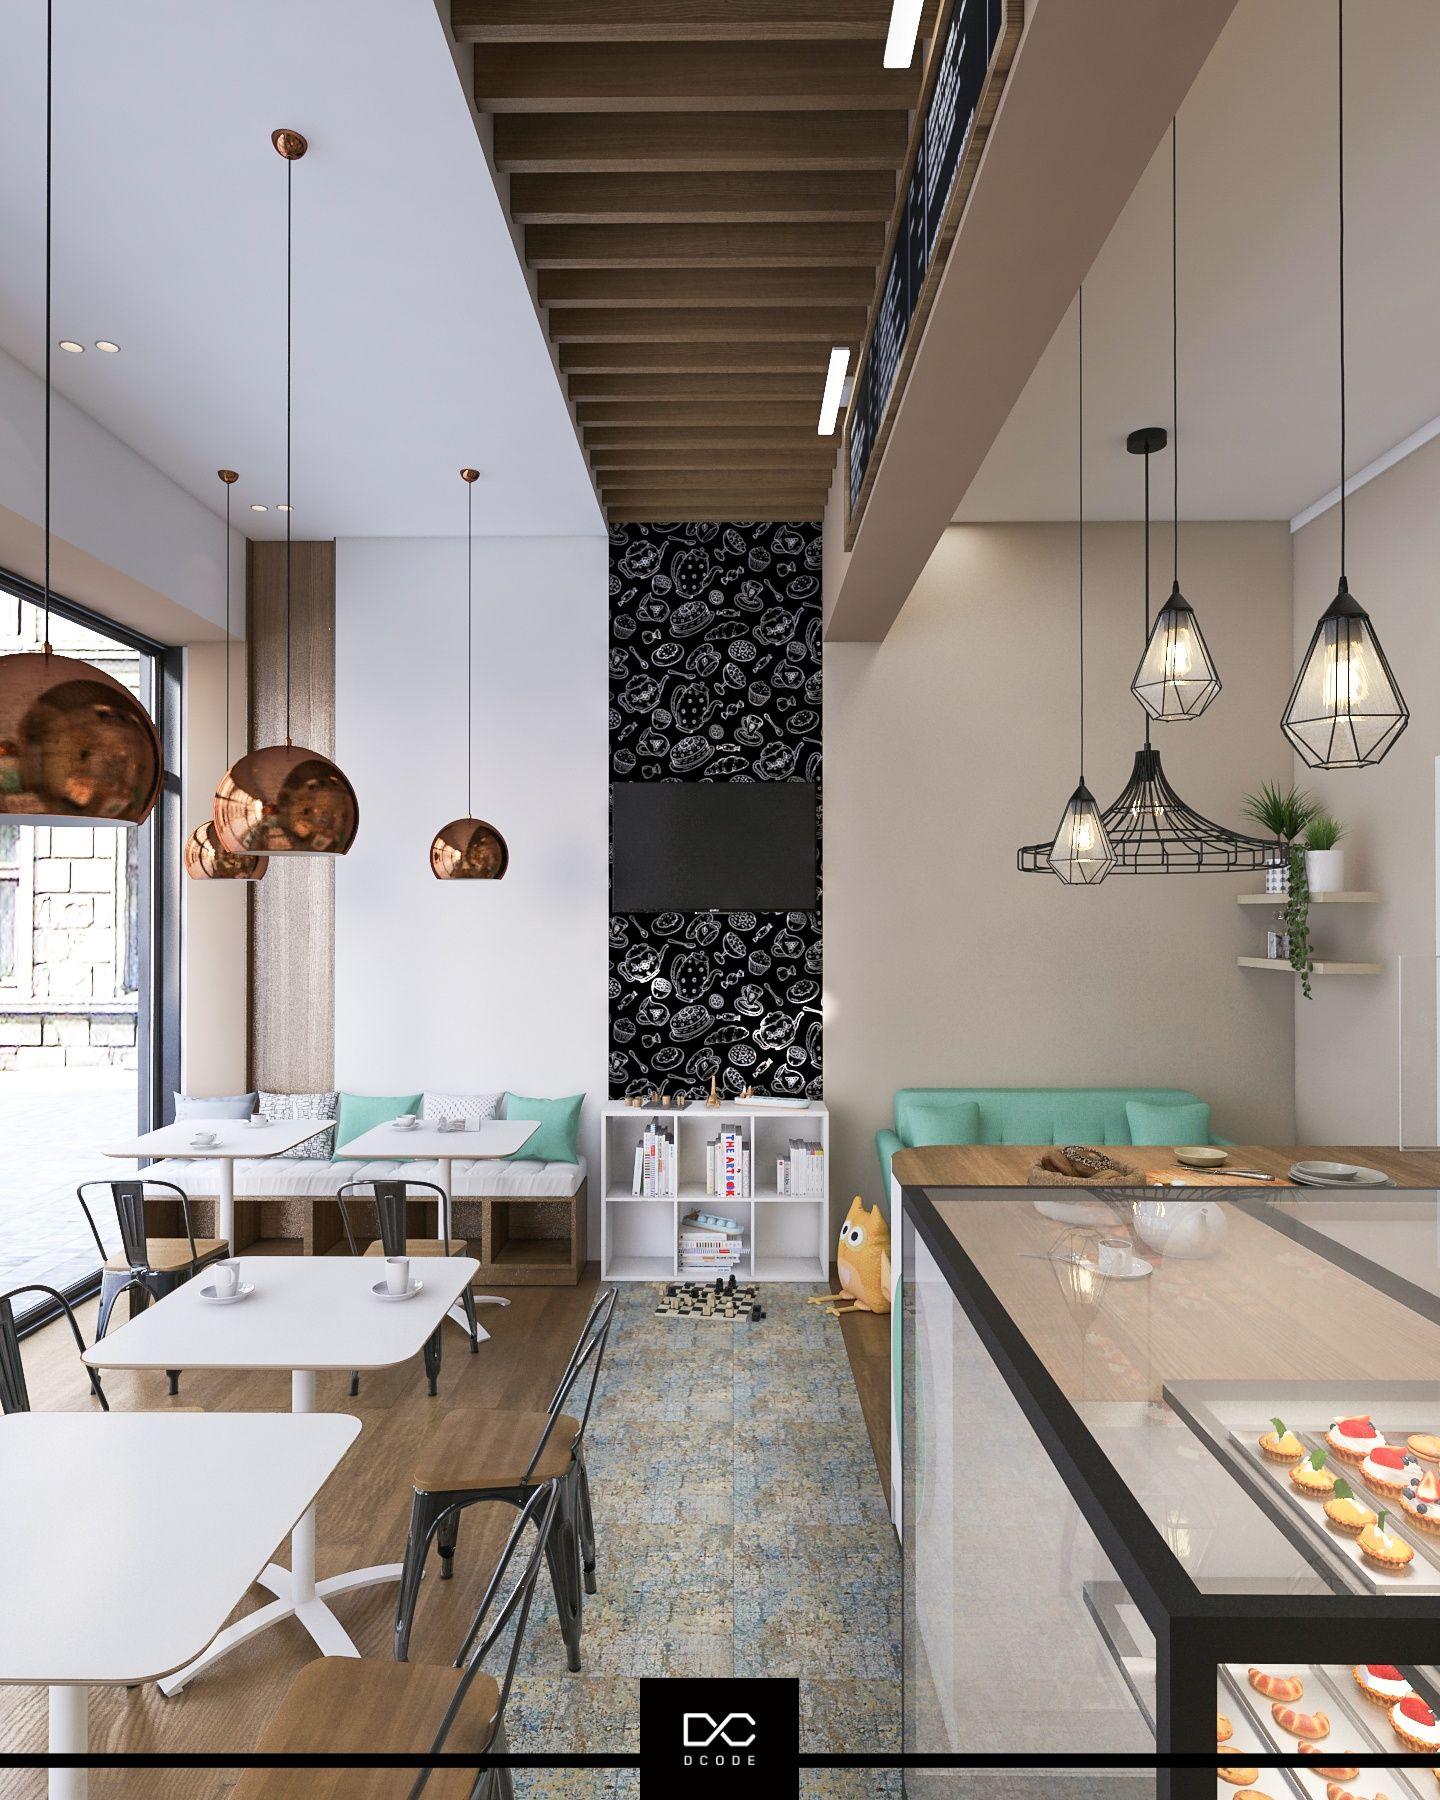 restaurant coffe cofee cate bar muffin bar interior classic rh in pinterest com